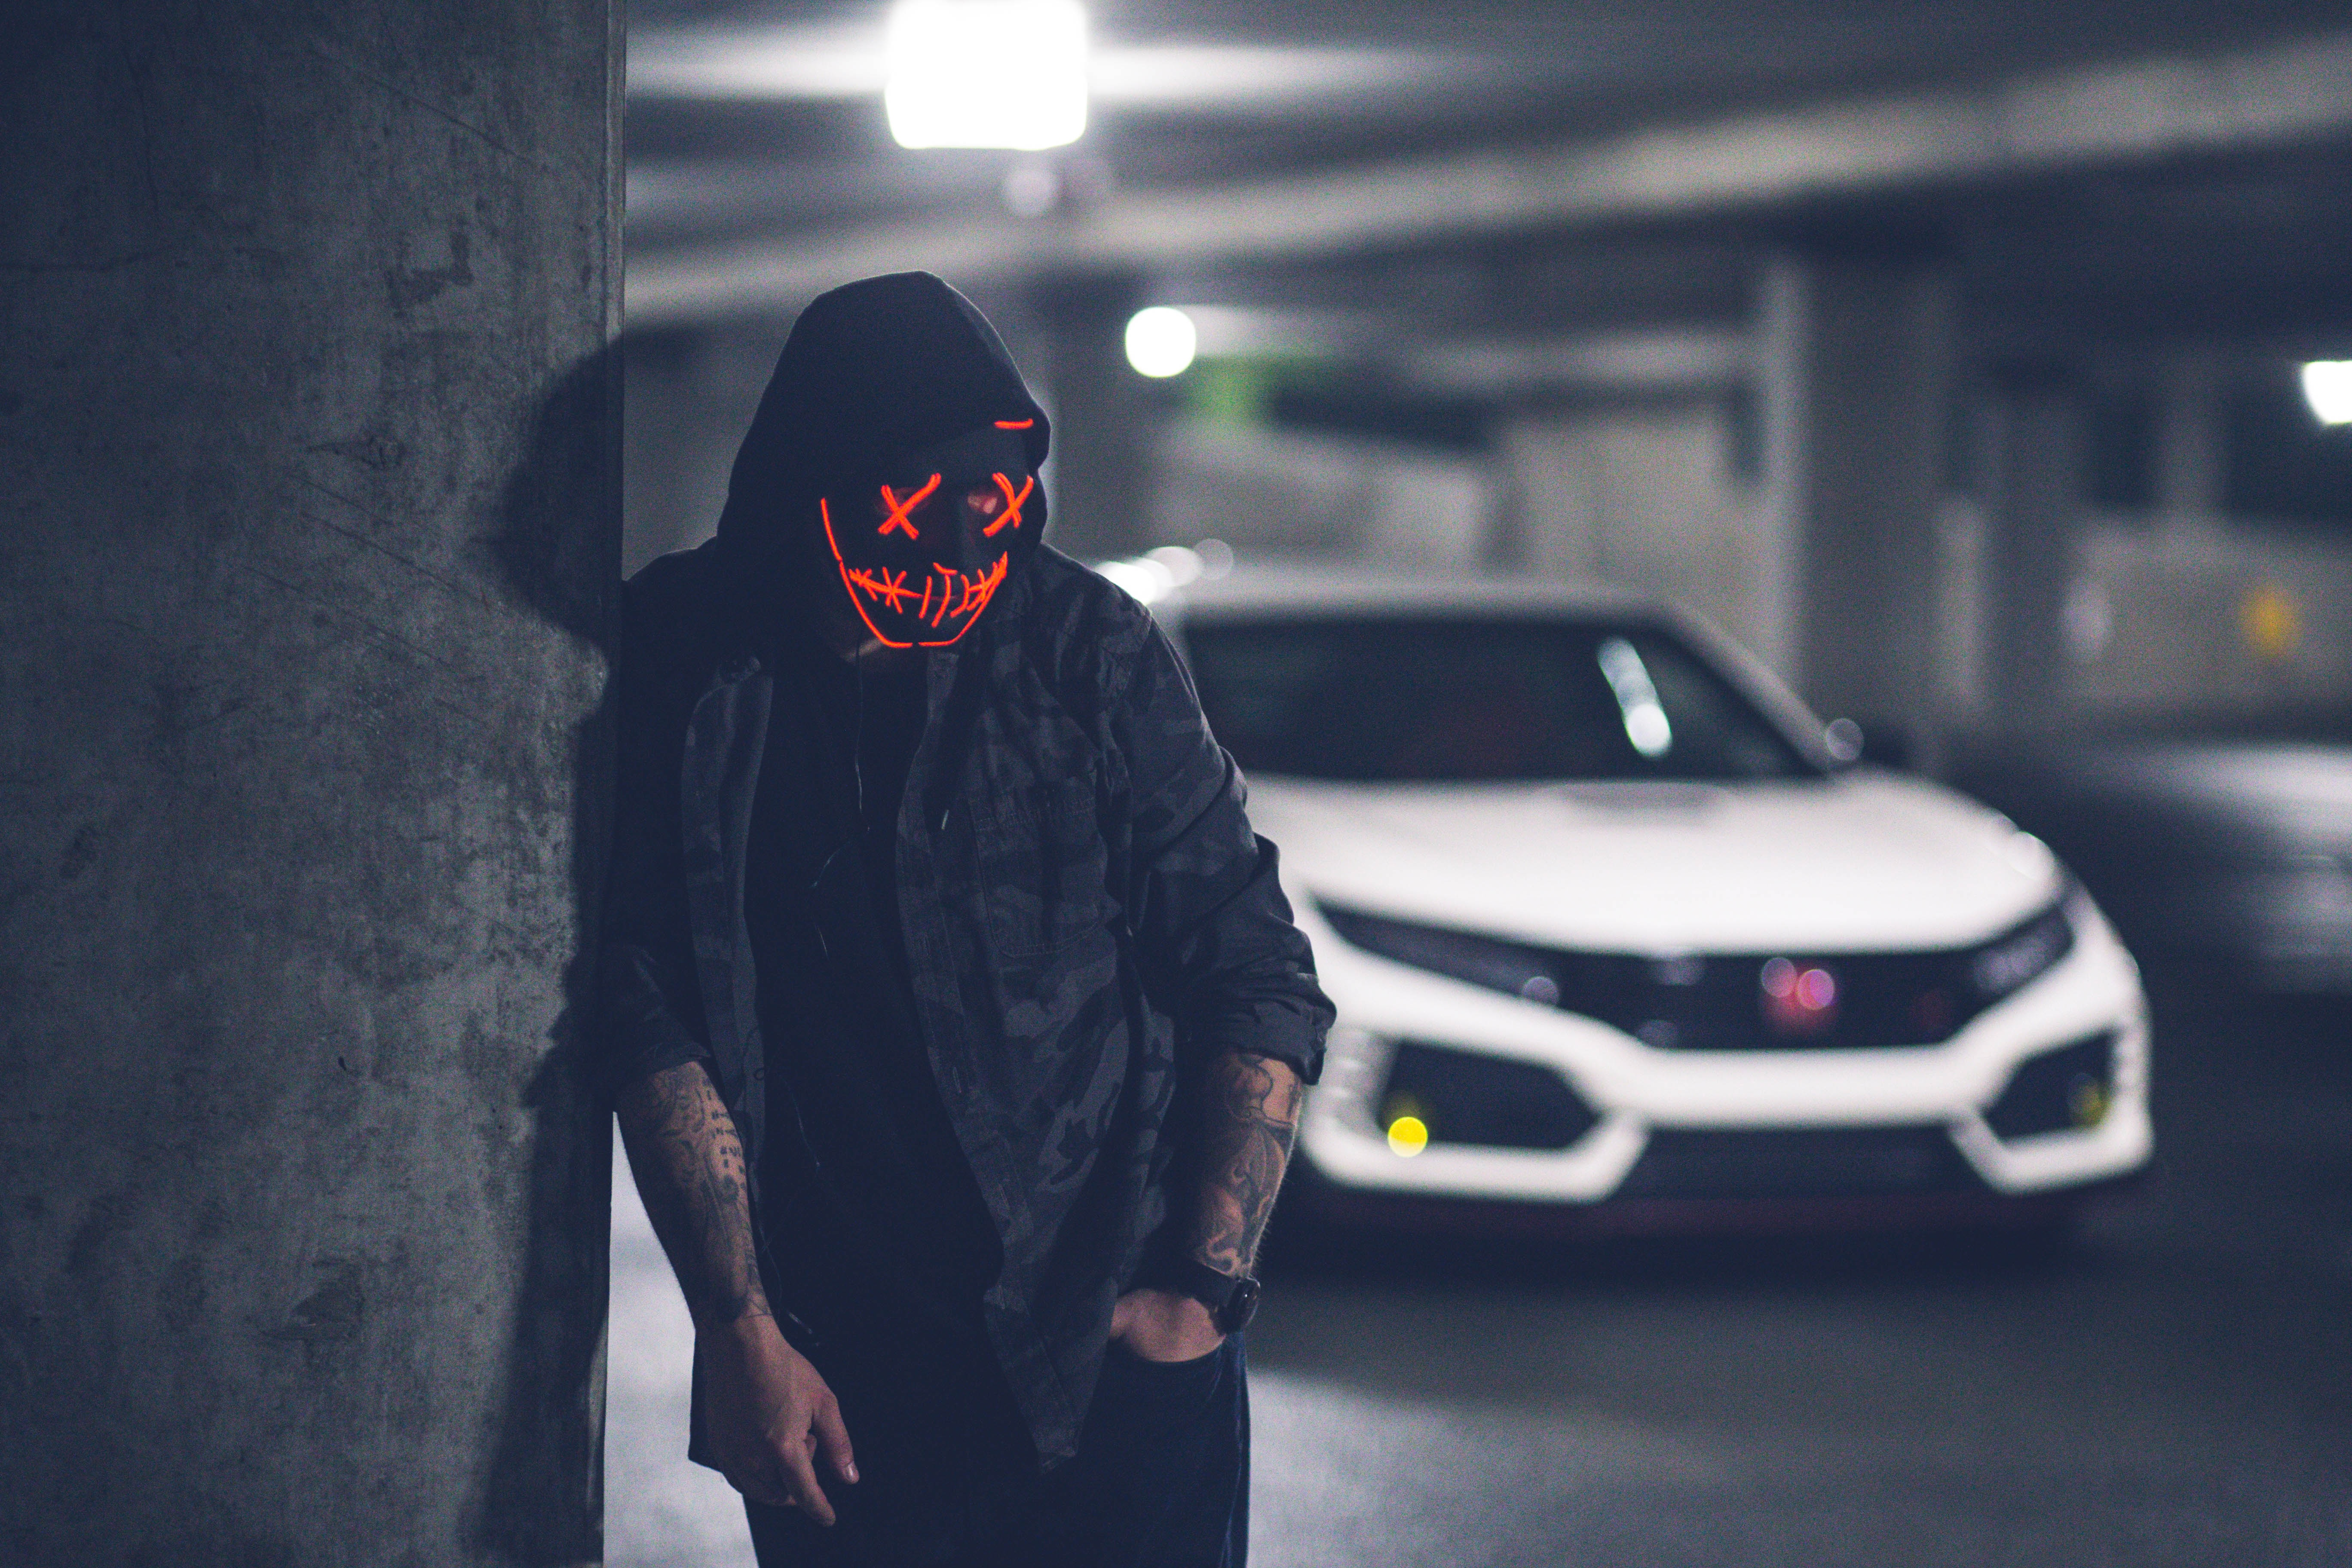 mask neon inked with car 1574938650 - Mask Neon Inked With Car -